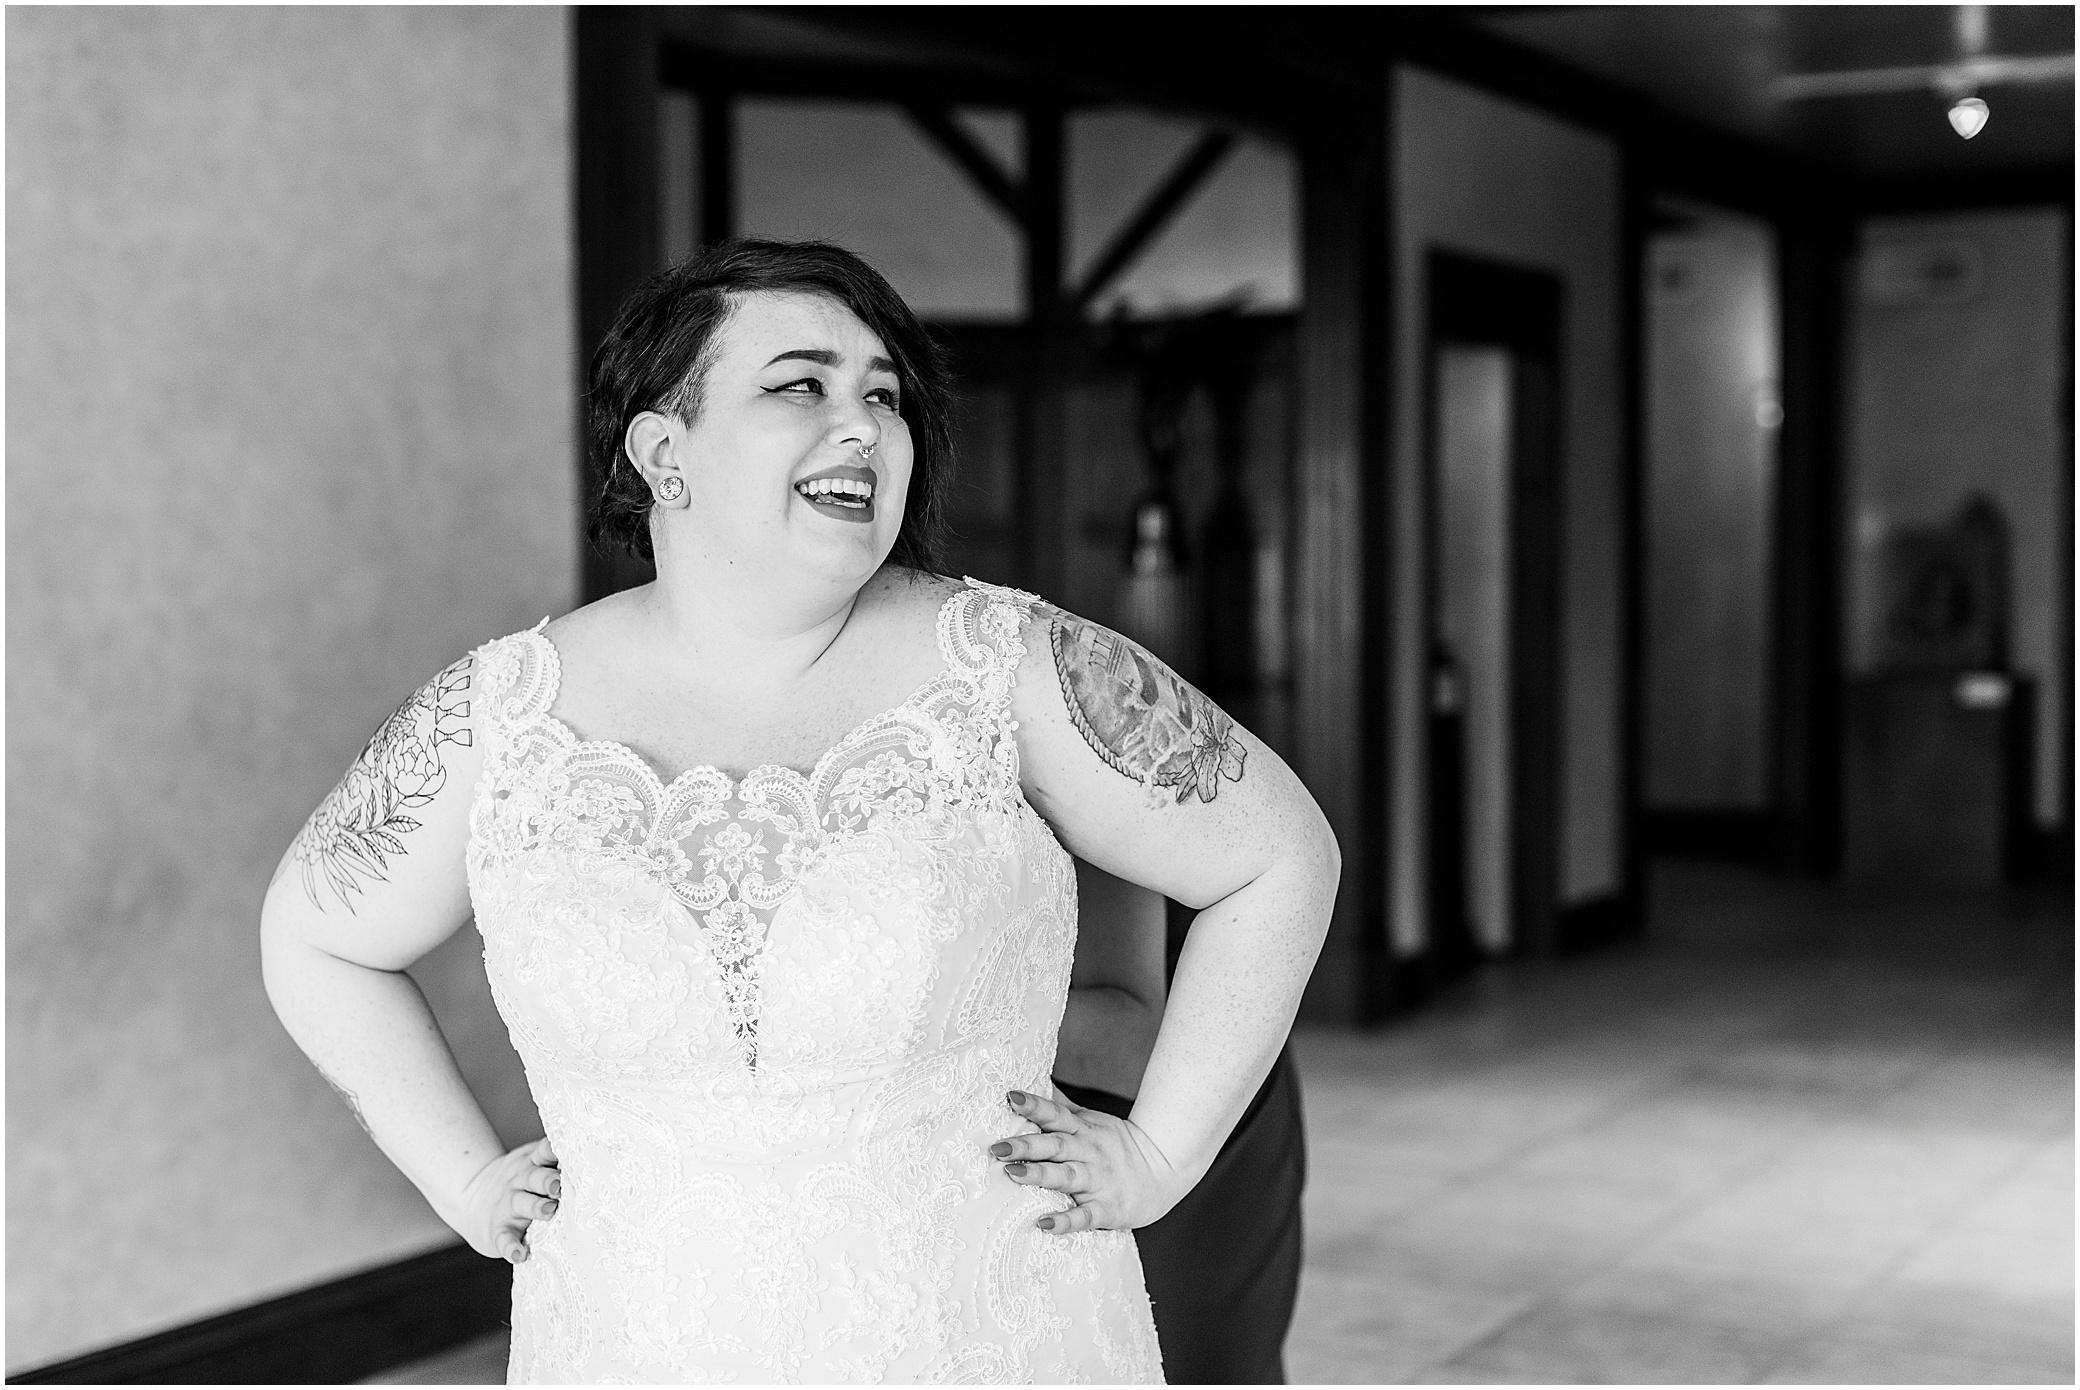 hermitage museum and gardens elopement, studio i do wedding dress, bride getting into wedding dress, tattooed bride